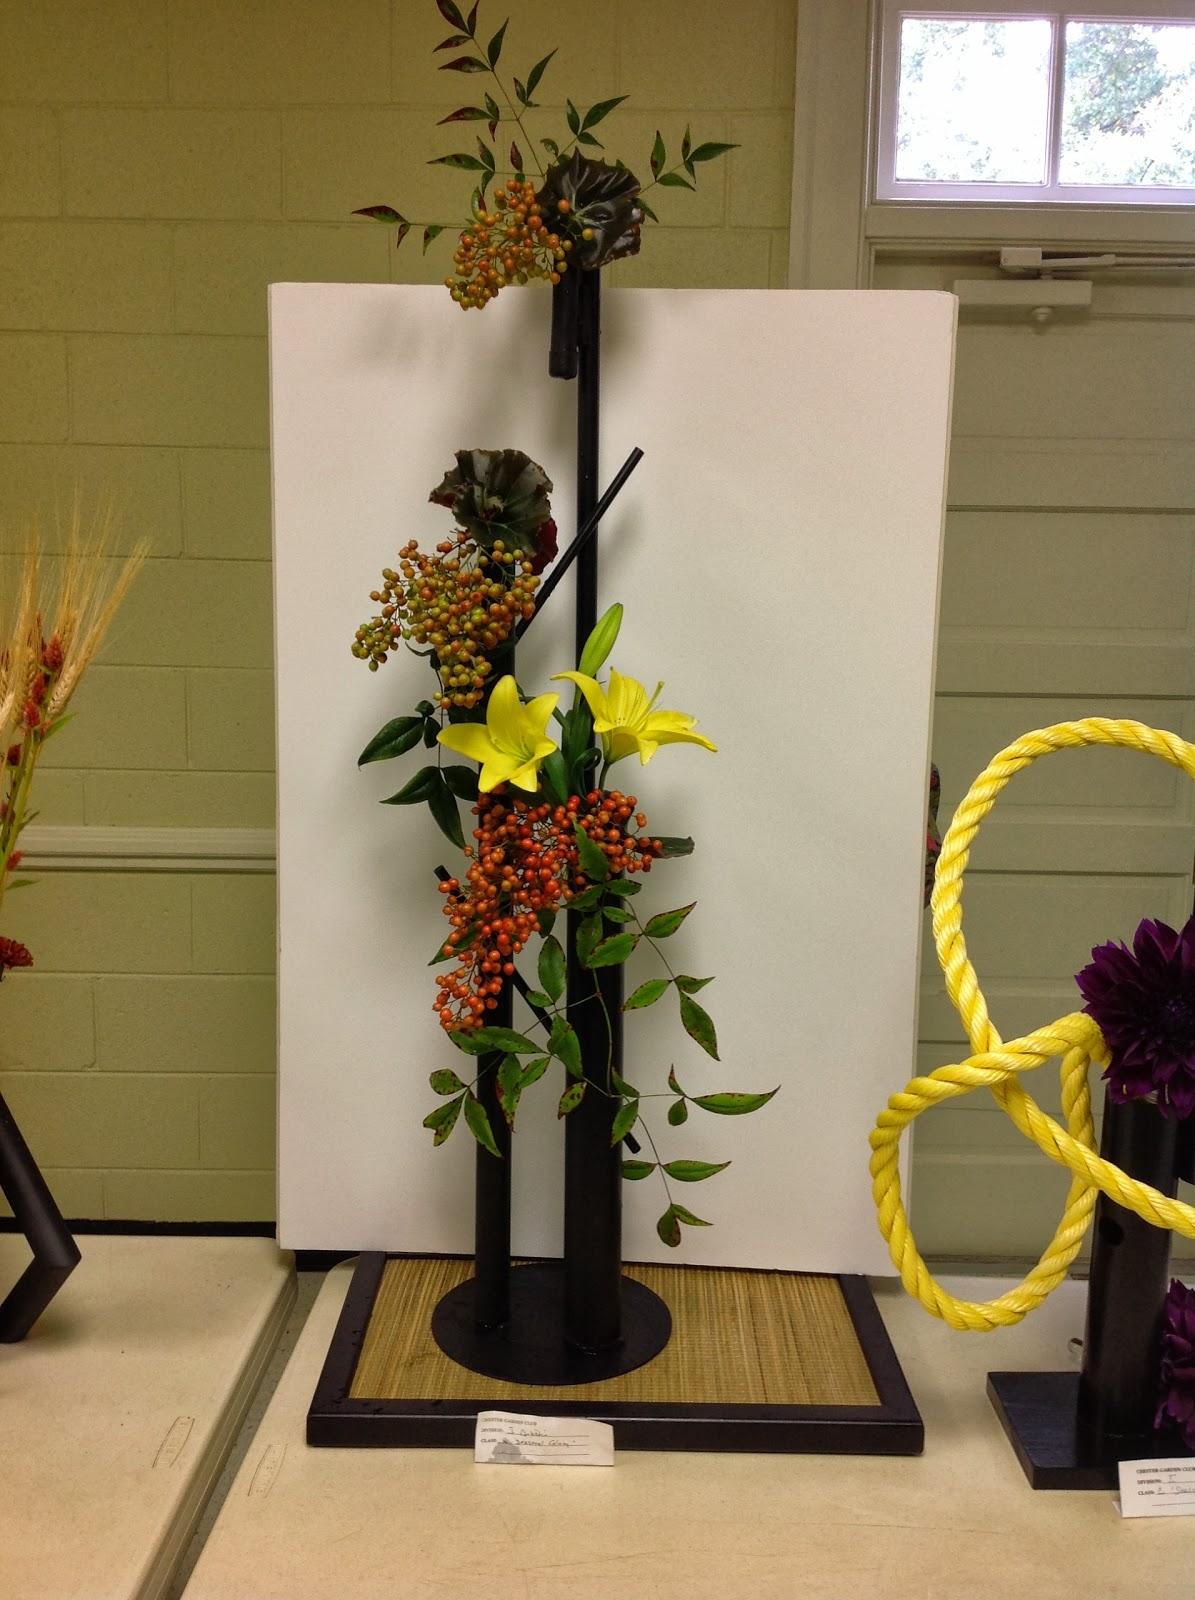 New Garden Club Journal A Creative and Tubular designs